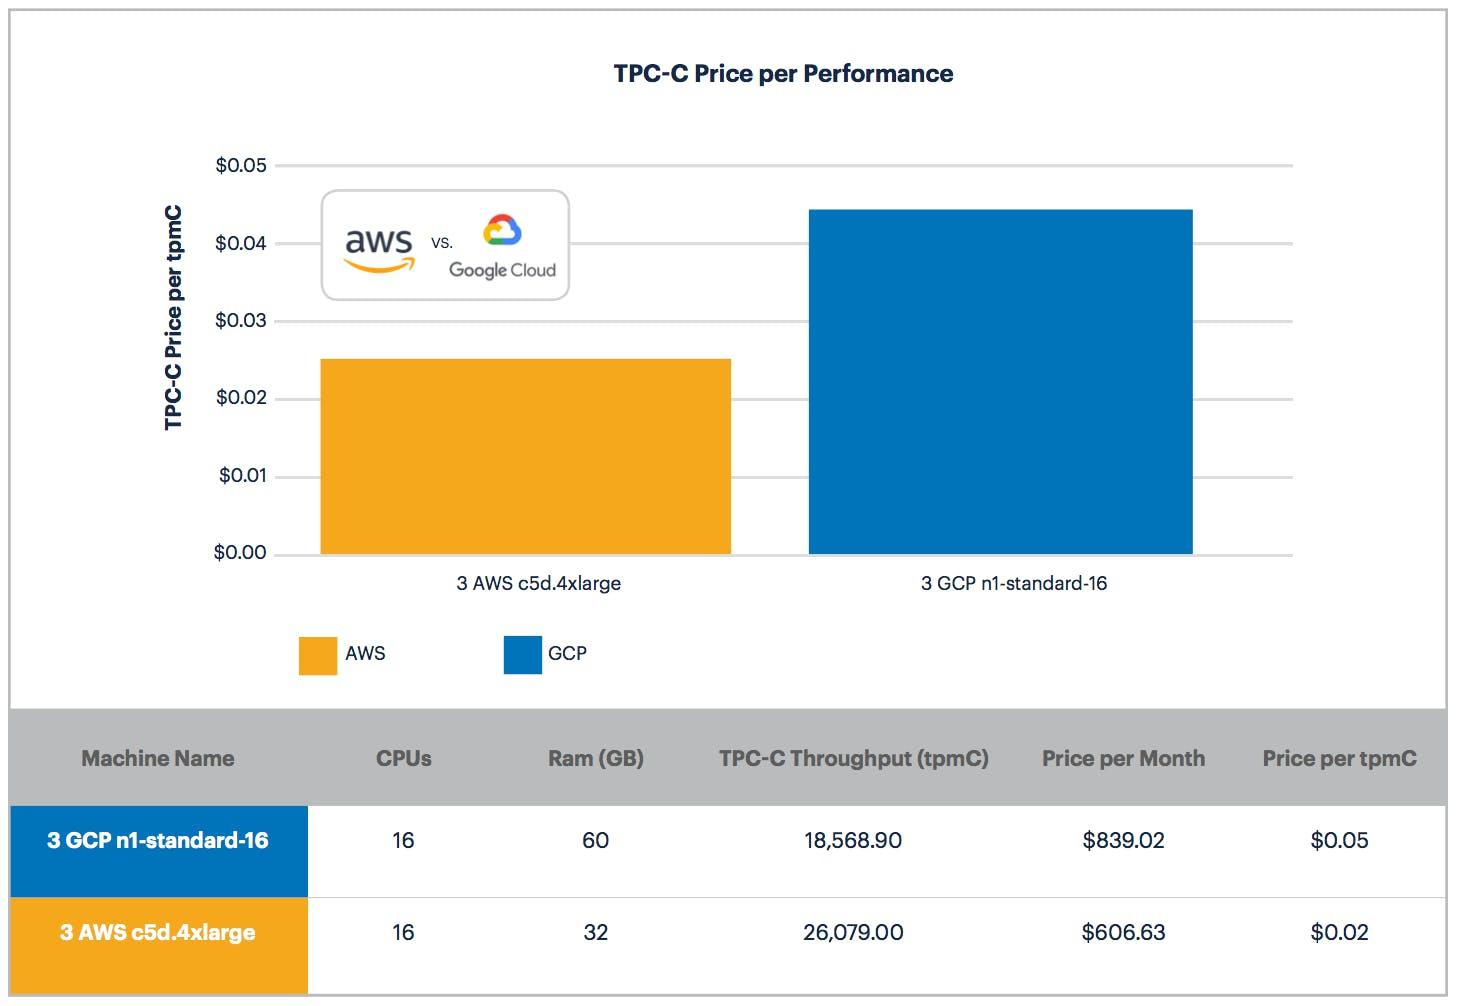 AWS vs. GCP: Price Per Performance on the TPC-C Benchmark